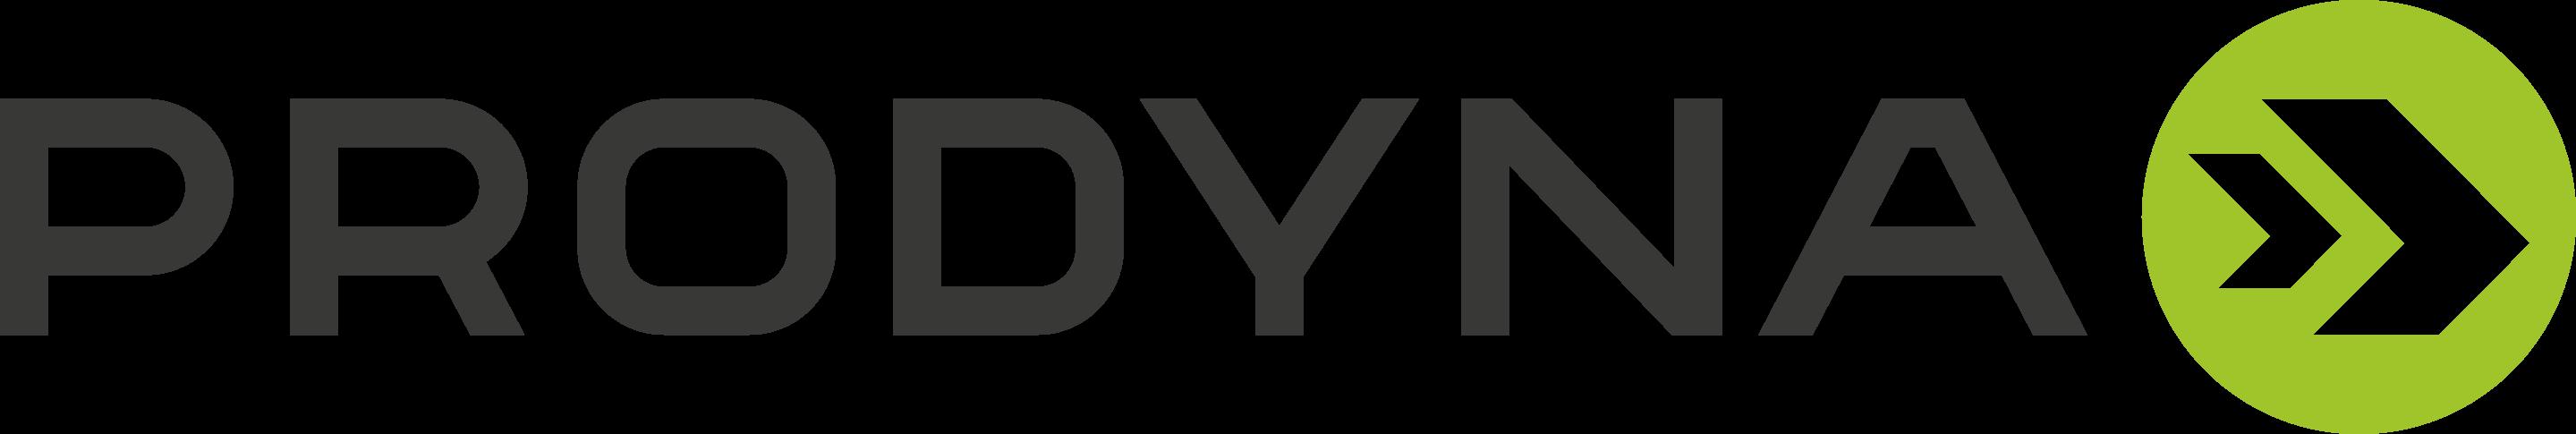 PRODYNA SE-logo